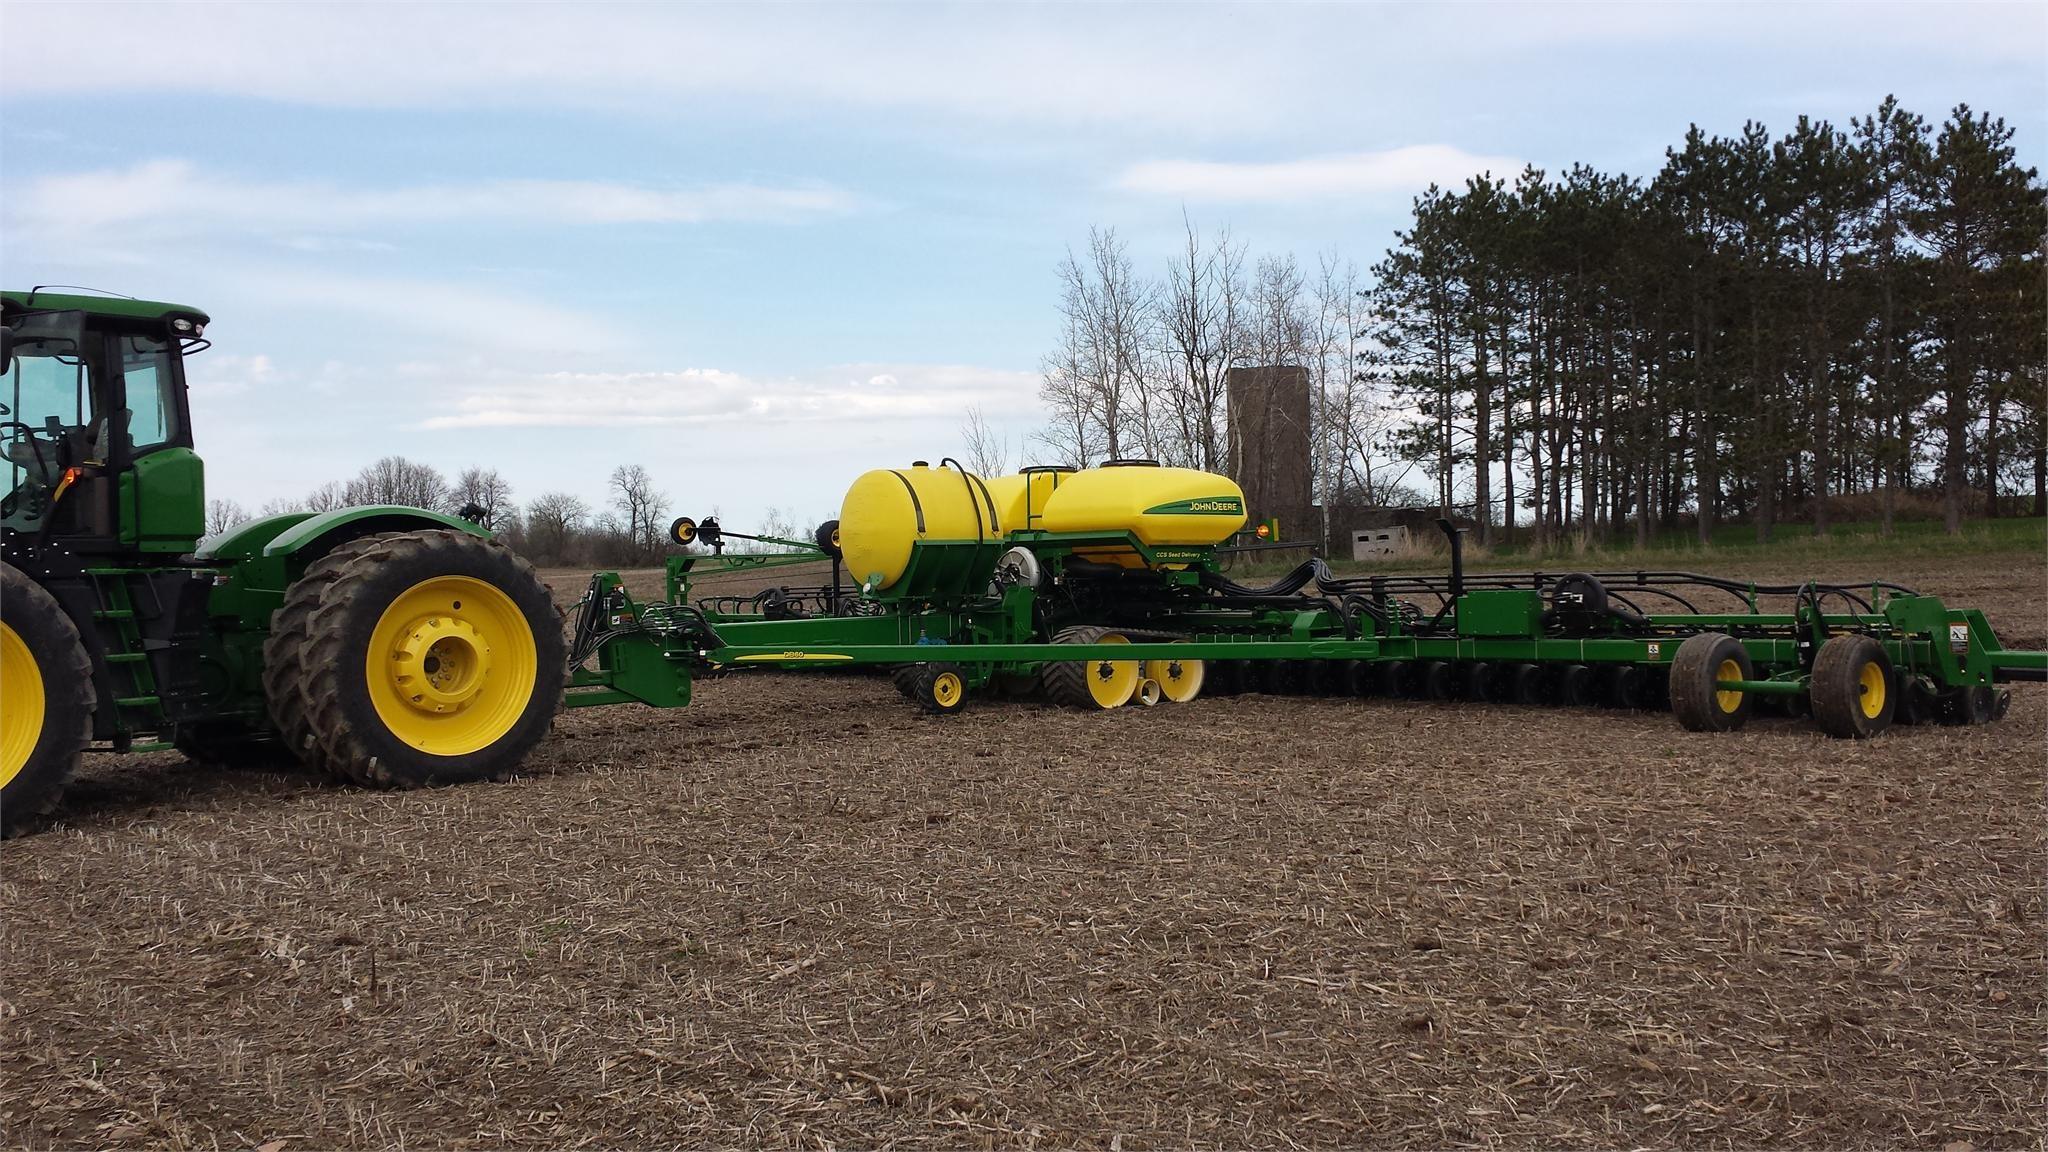 2014 JOHN DEERE DB60 Row Crop Planter $259,900.00